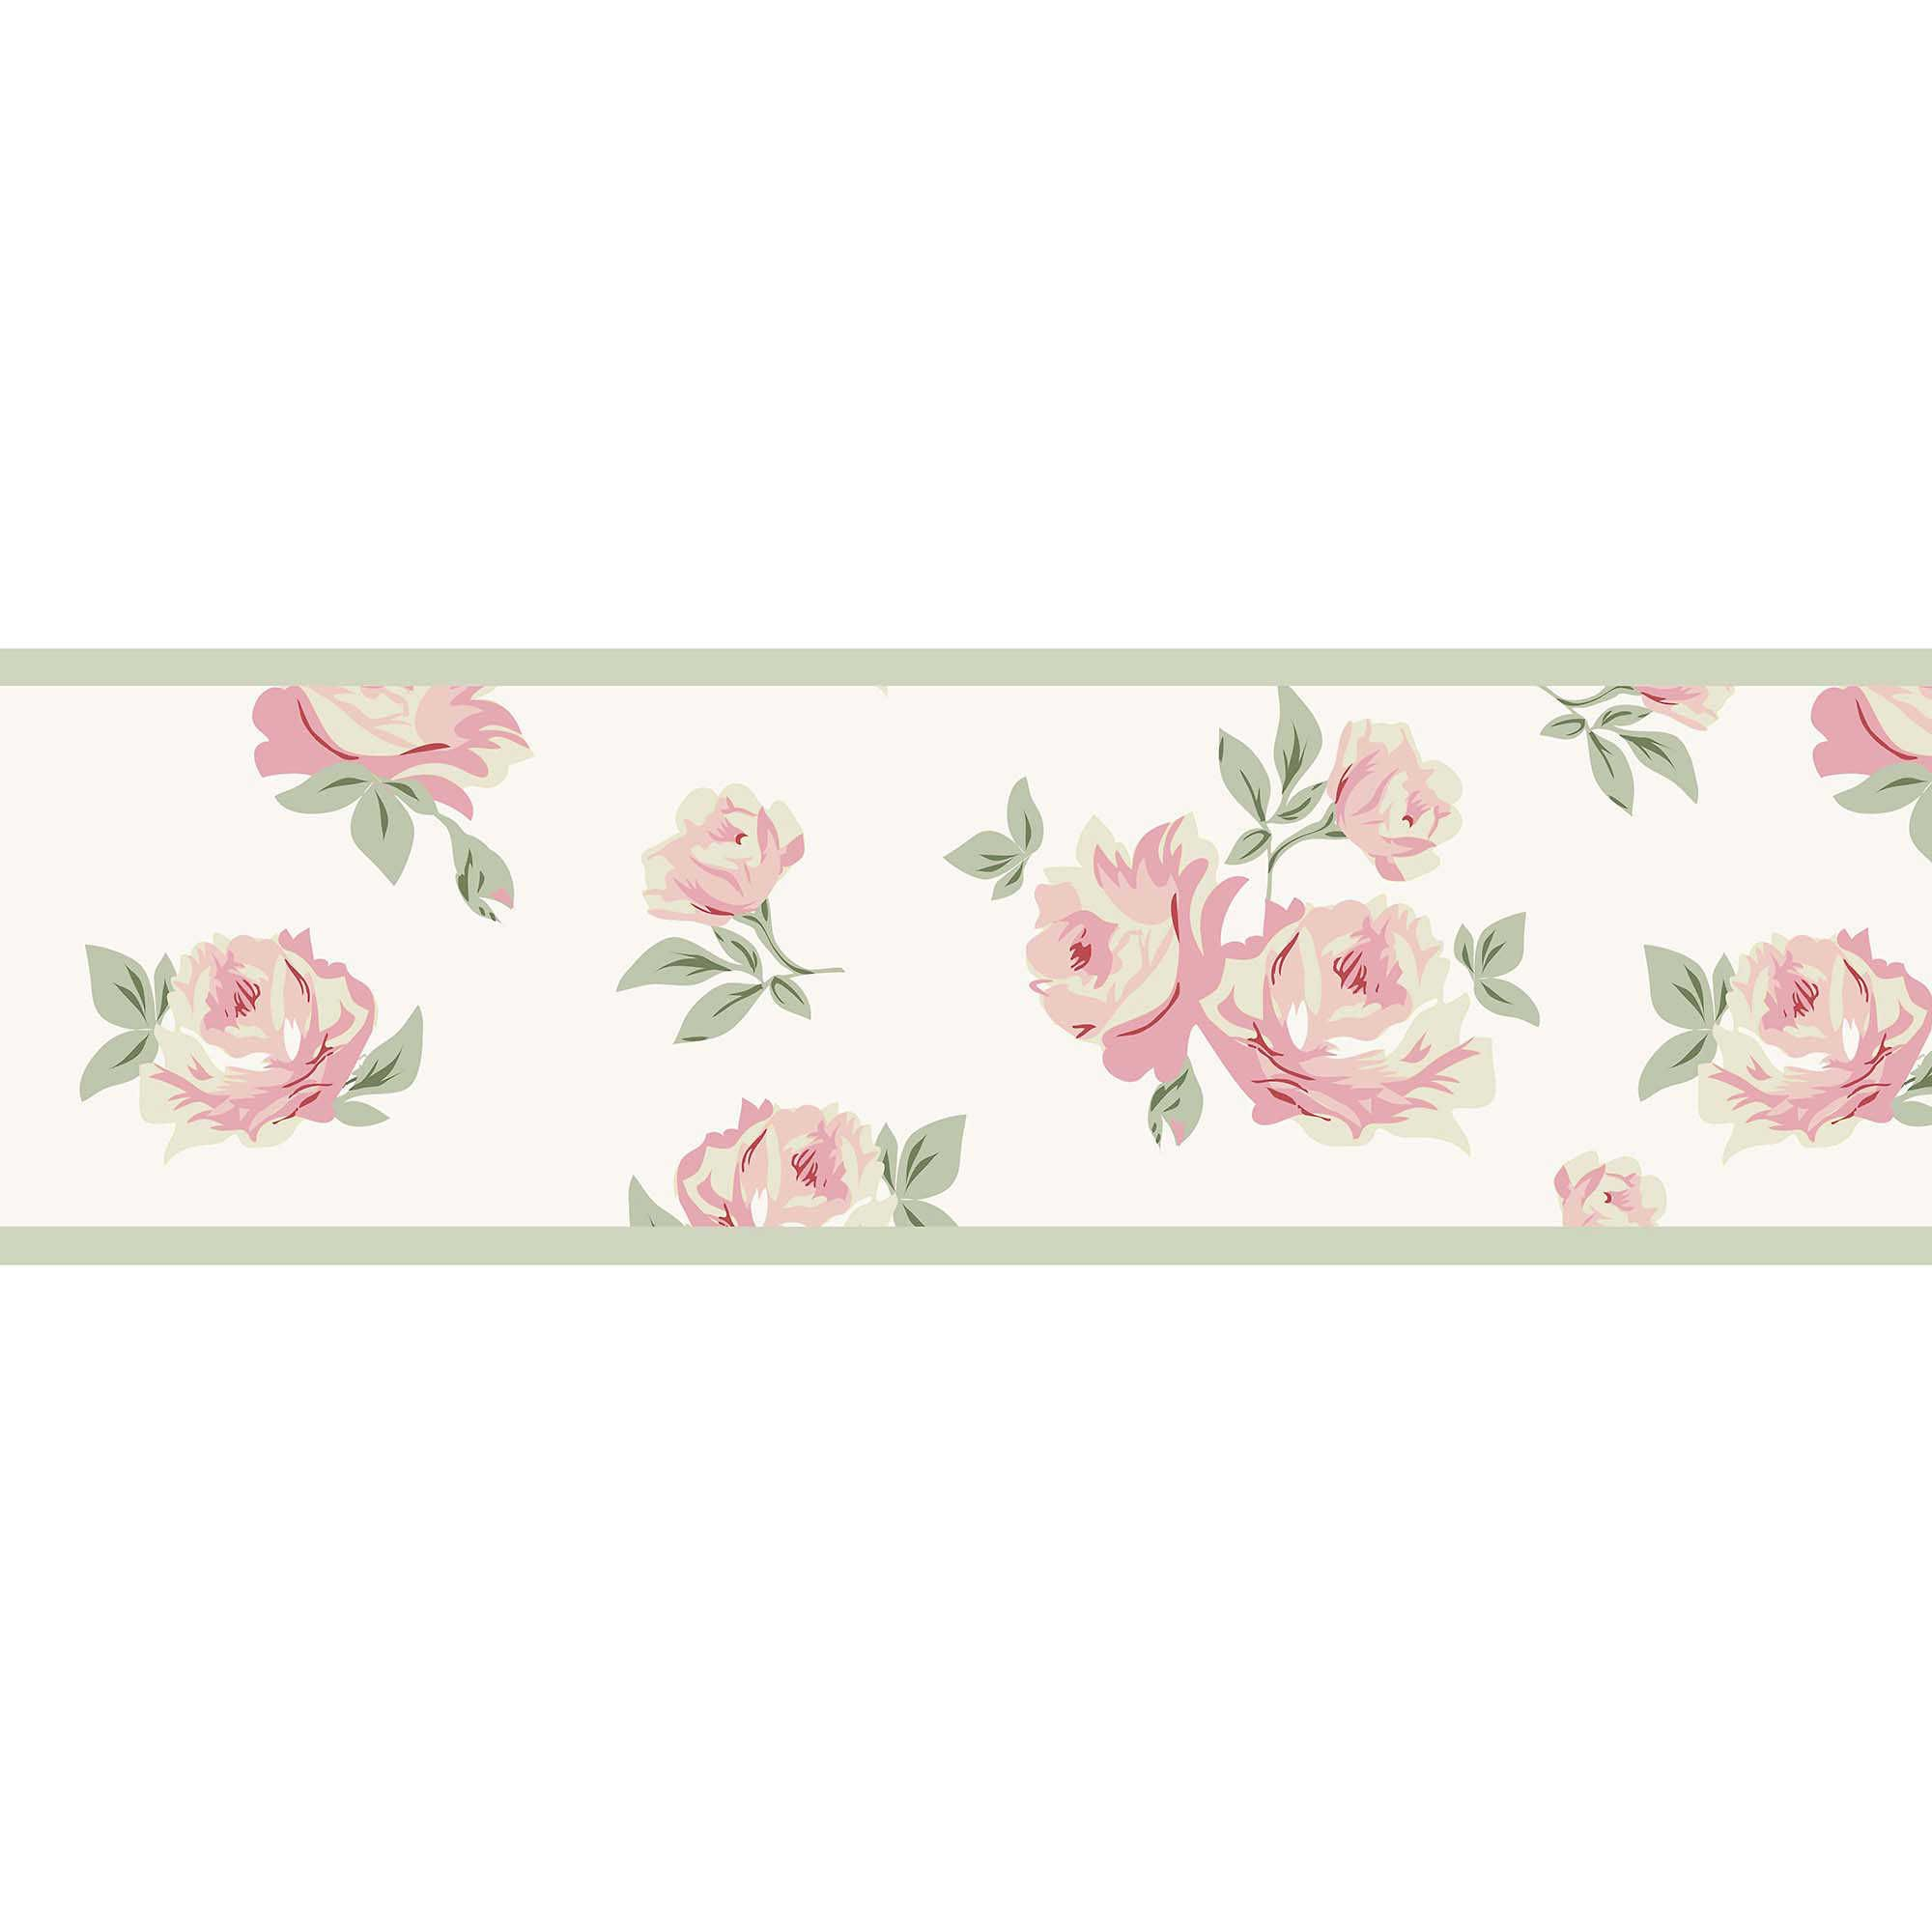 Sweet Jojo Designs Riley 39 S Roses Wallpaper Border Rose Wallpaper Baby Nursery Wall Decor Jojo Designs